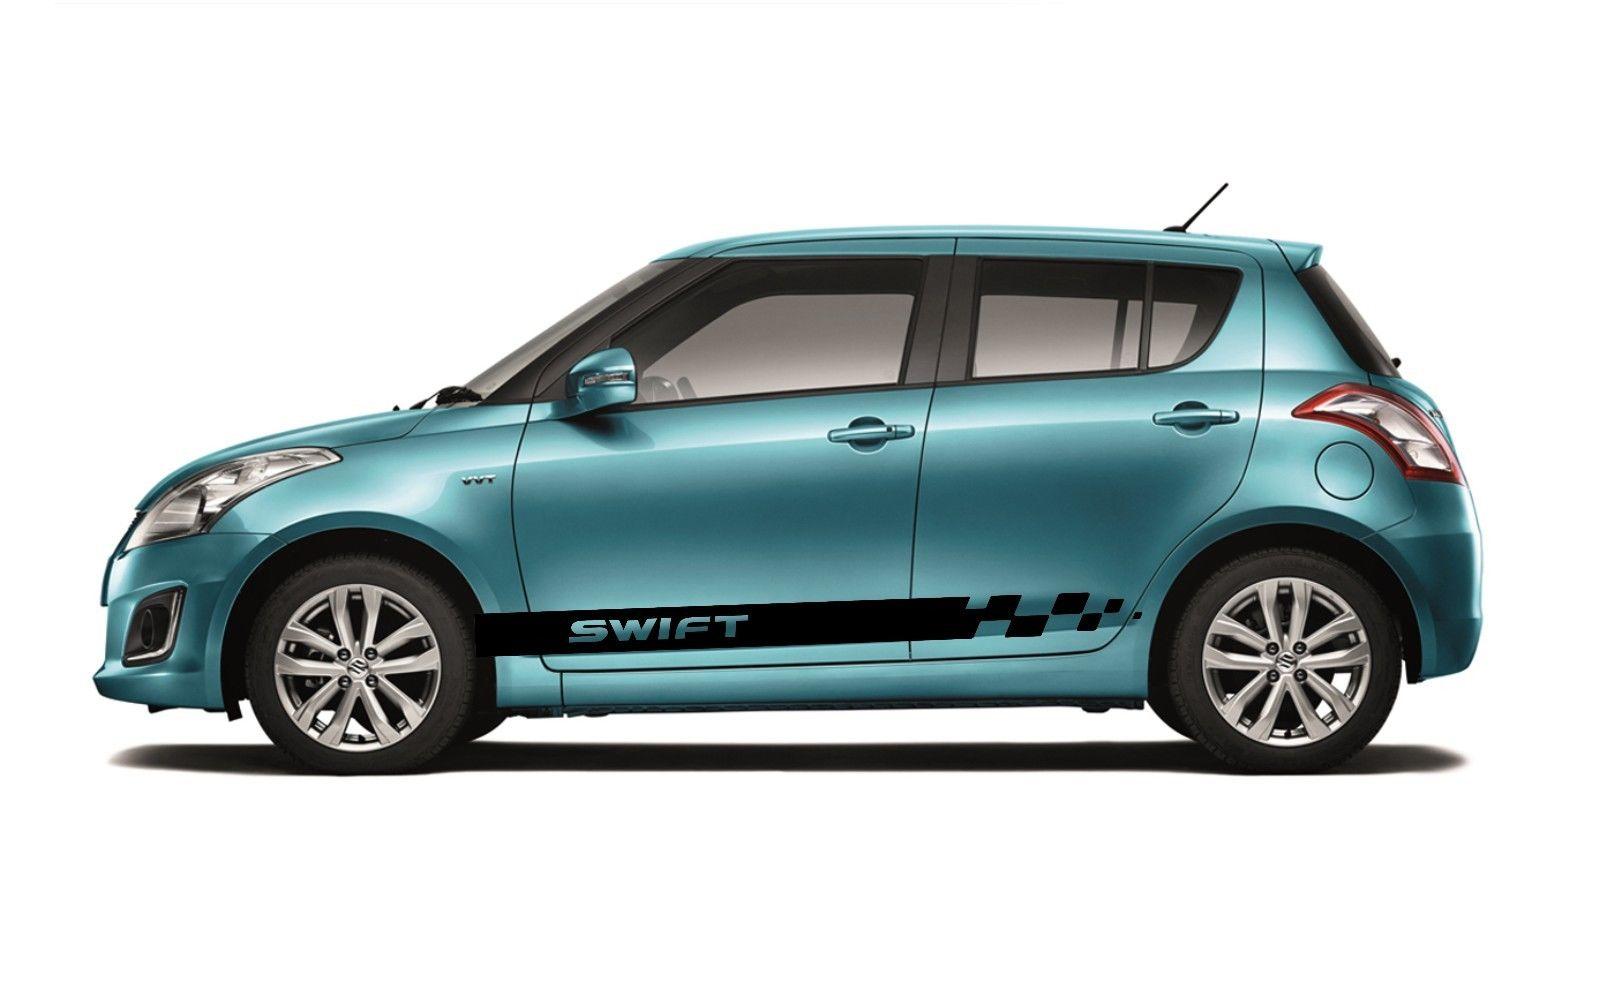 Car Styling For 2x Suzuki Swift Side Skirt Vinyl Body